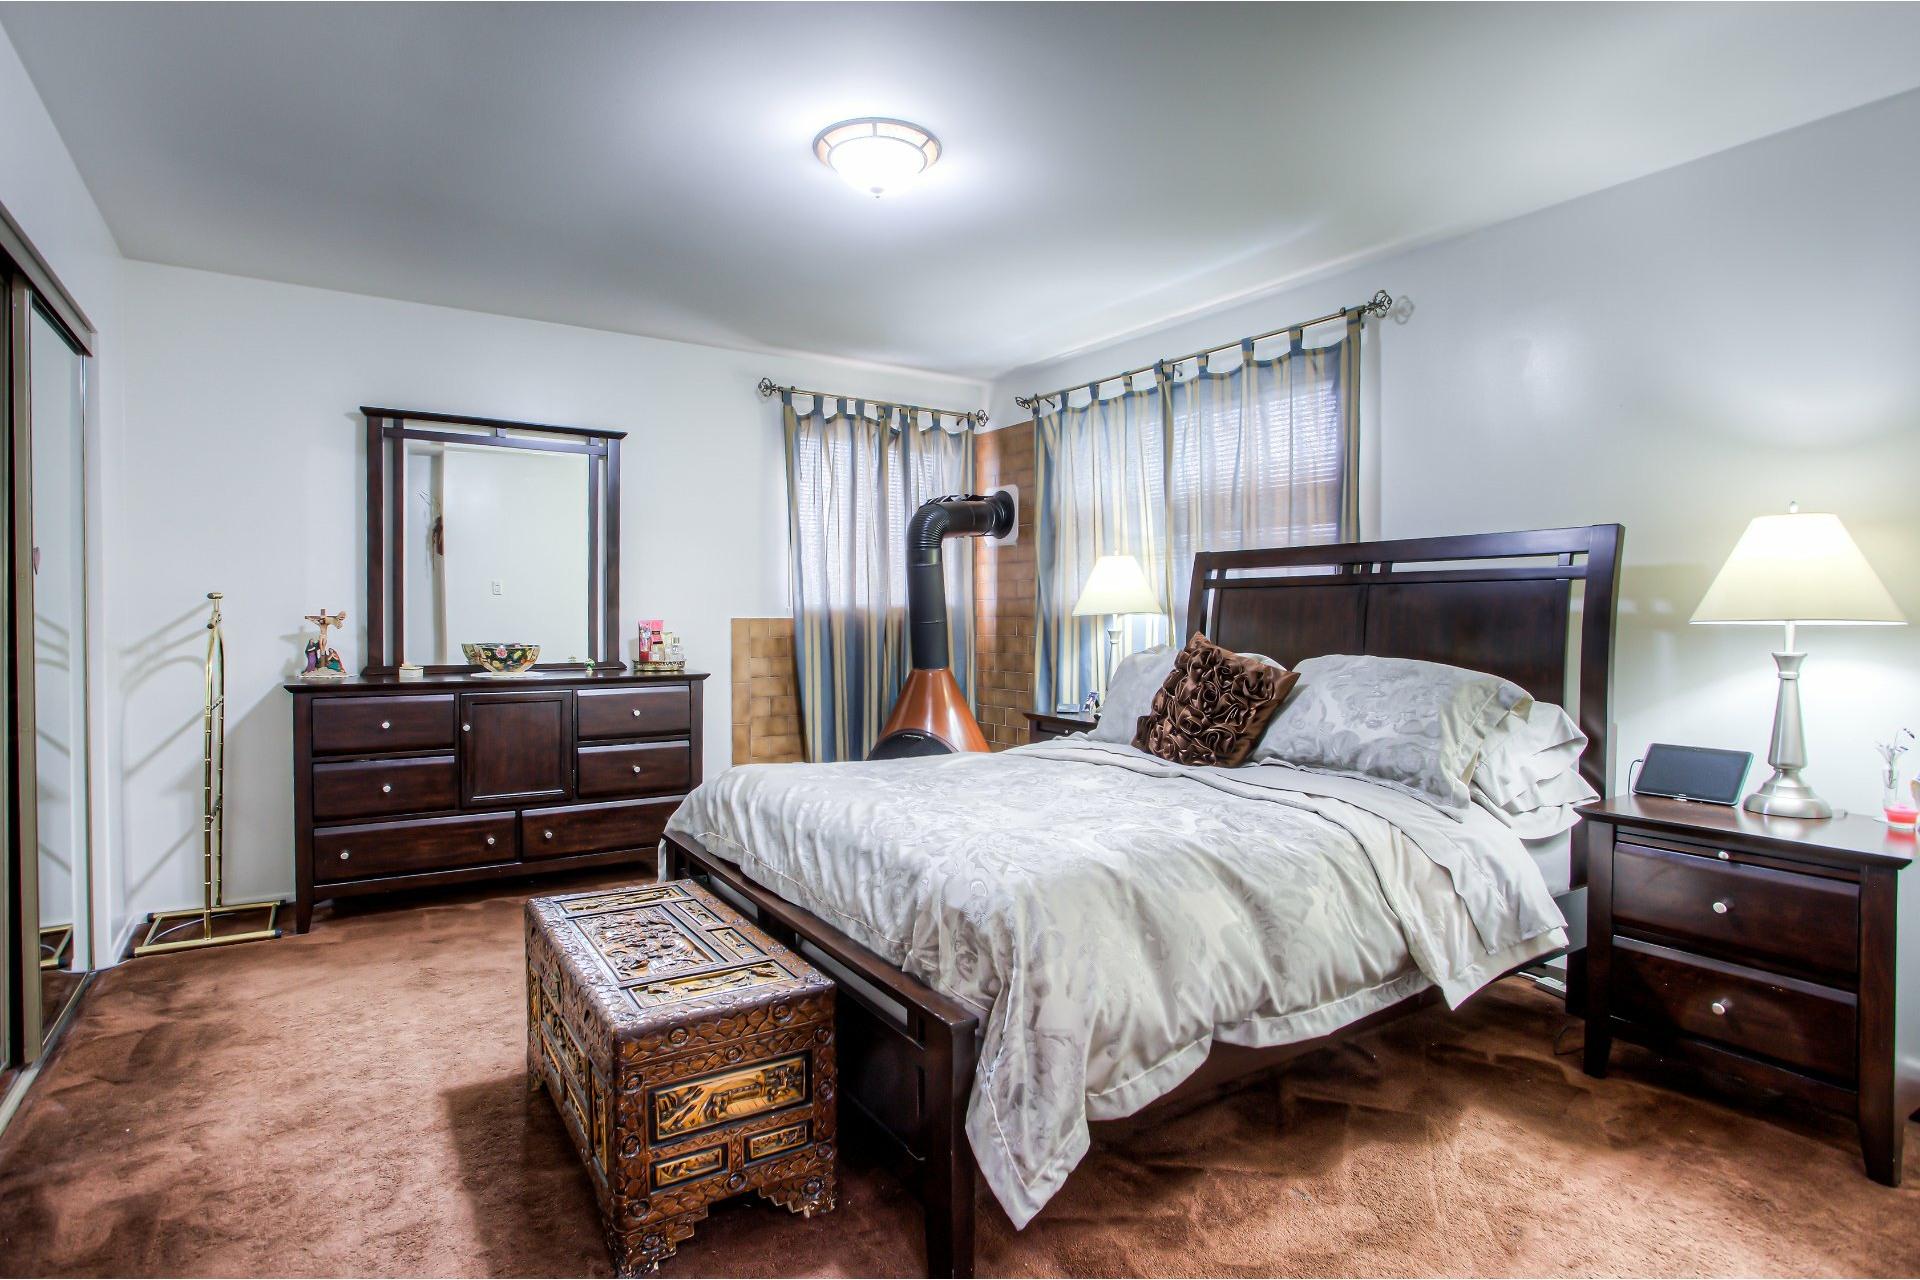 image 9 - MX - Casa sola - MX En venta Dollard-Des Ormeaux - 11 habitaciones